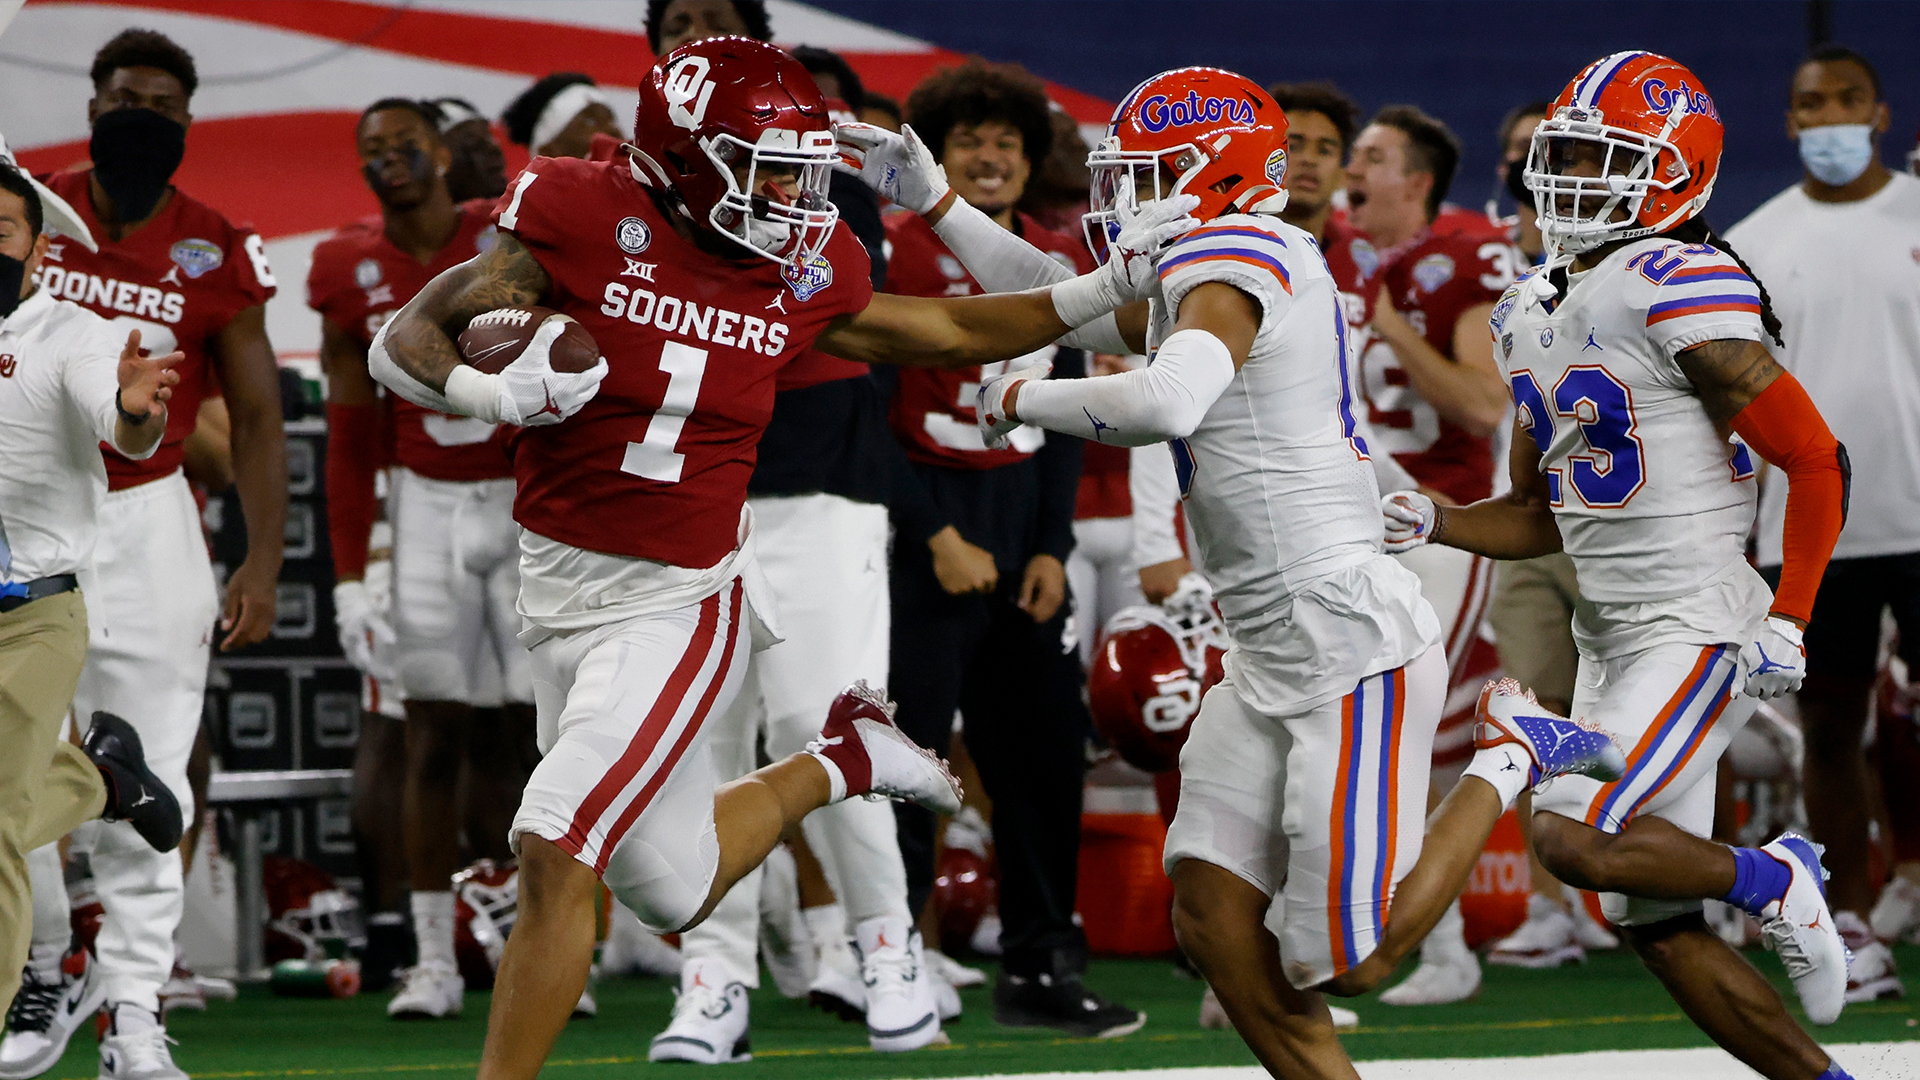 Gators rattled: No. 8 Oklahoma routs Florida in Cotton Bowl | WFLA